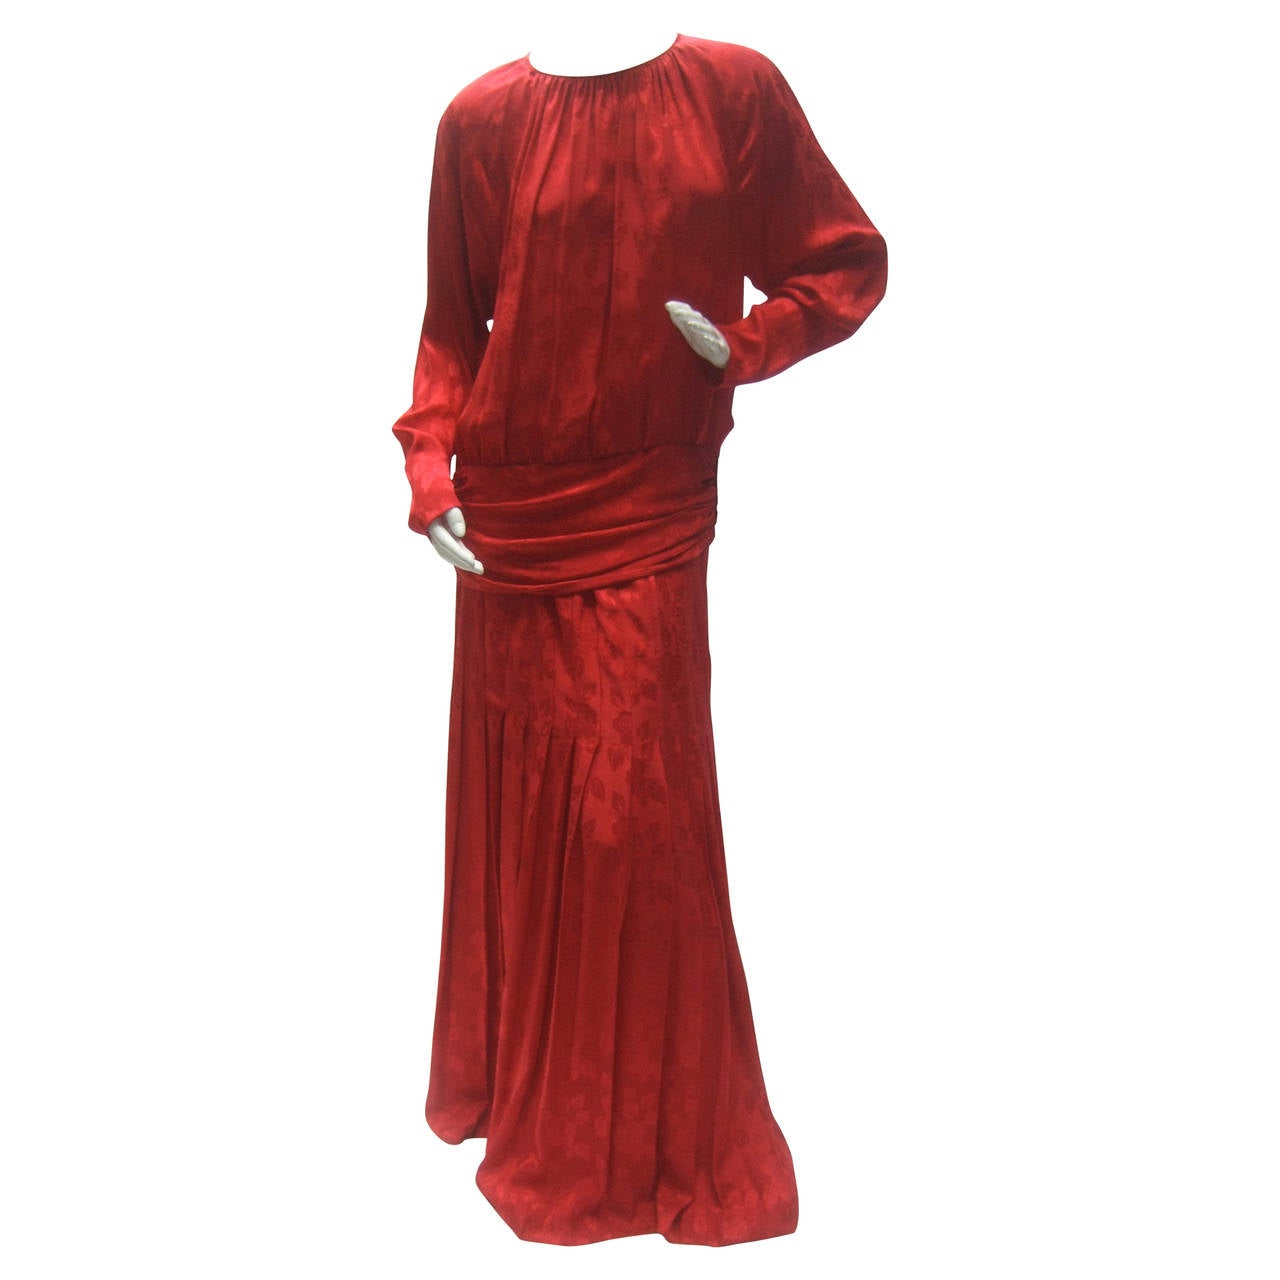 Oscar de la Renta Scarlet Silk Blouse & Maxi Skirt c 1980